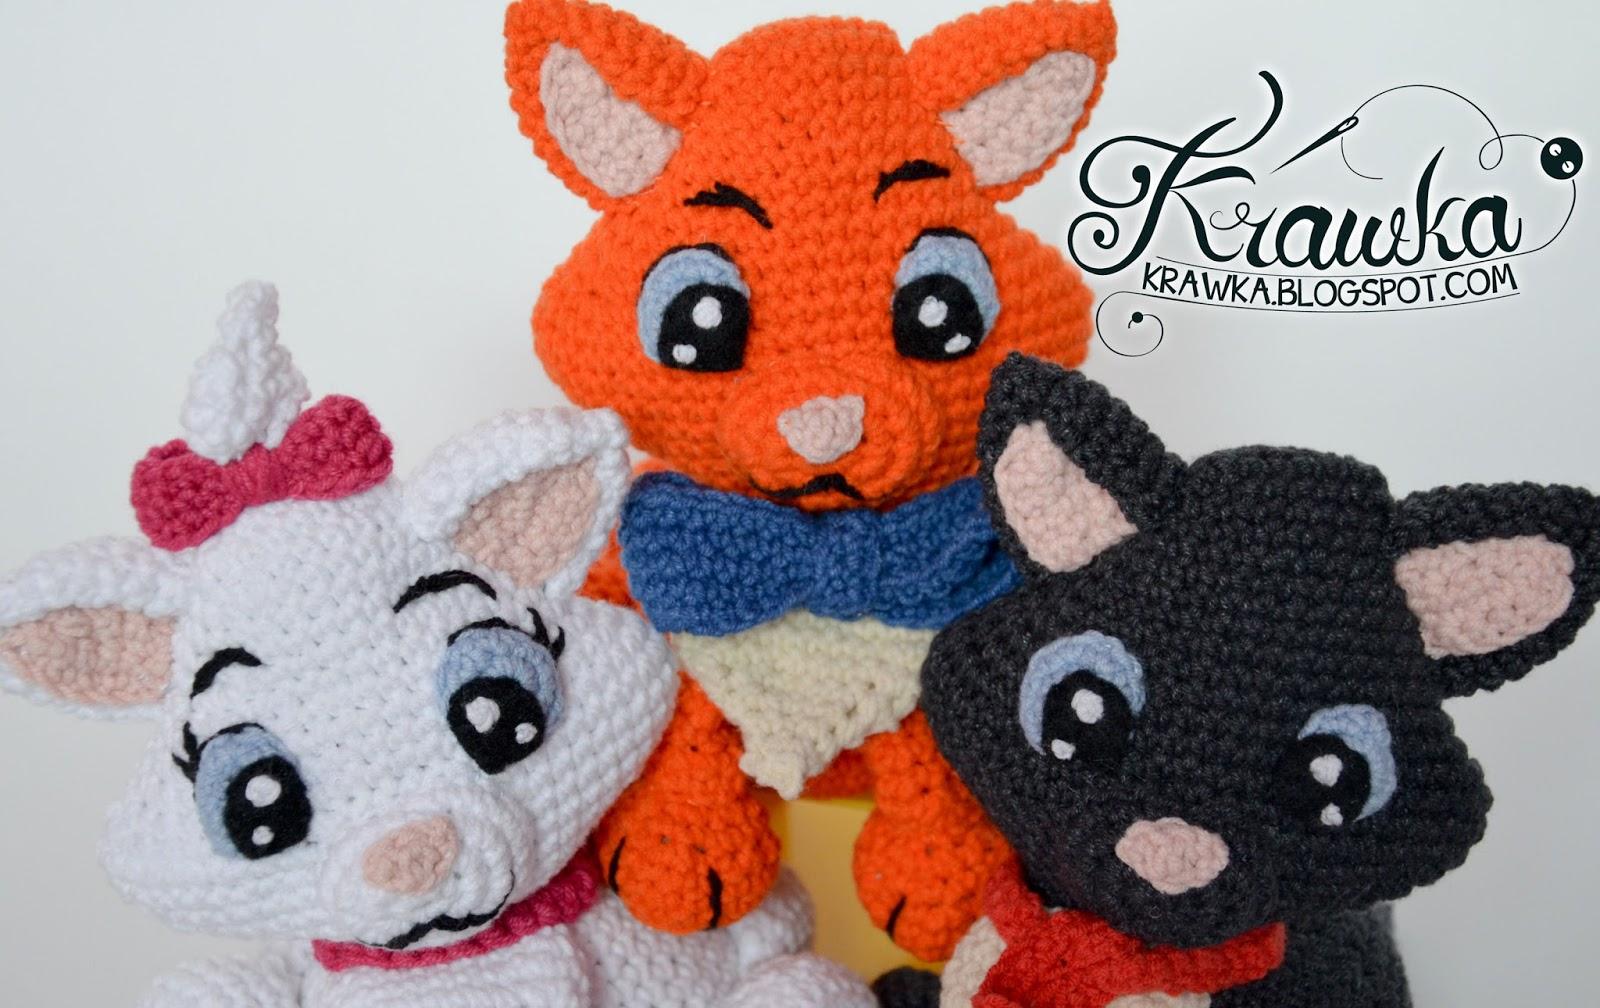 Amigurumi Patterns Disney : Krawka aristocats marie belioz toulouse disney cats etsy